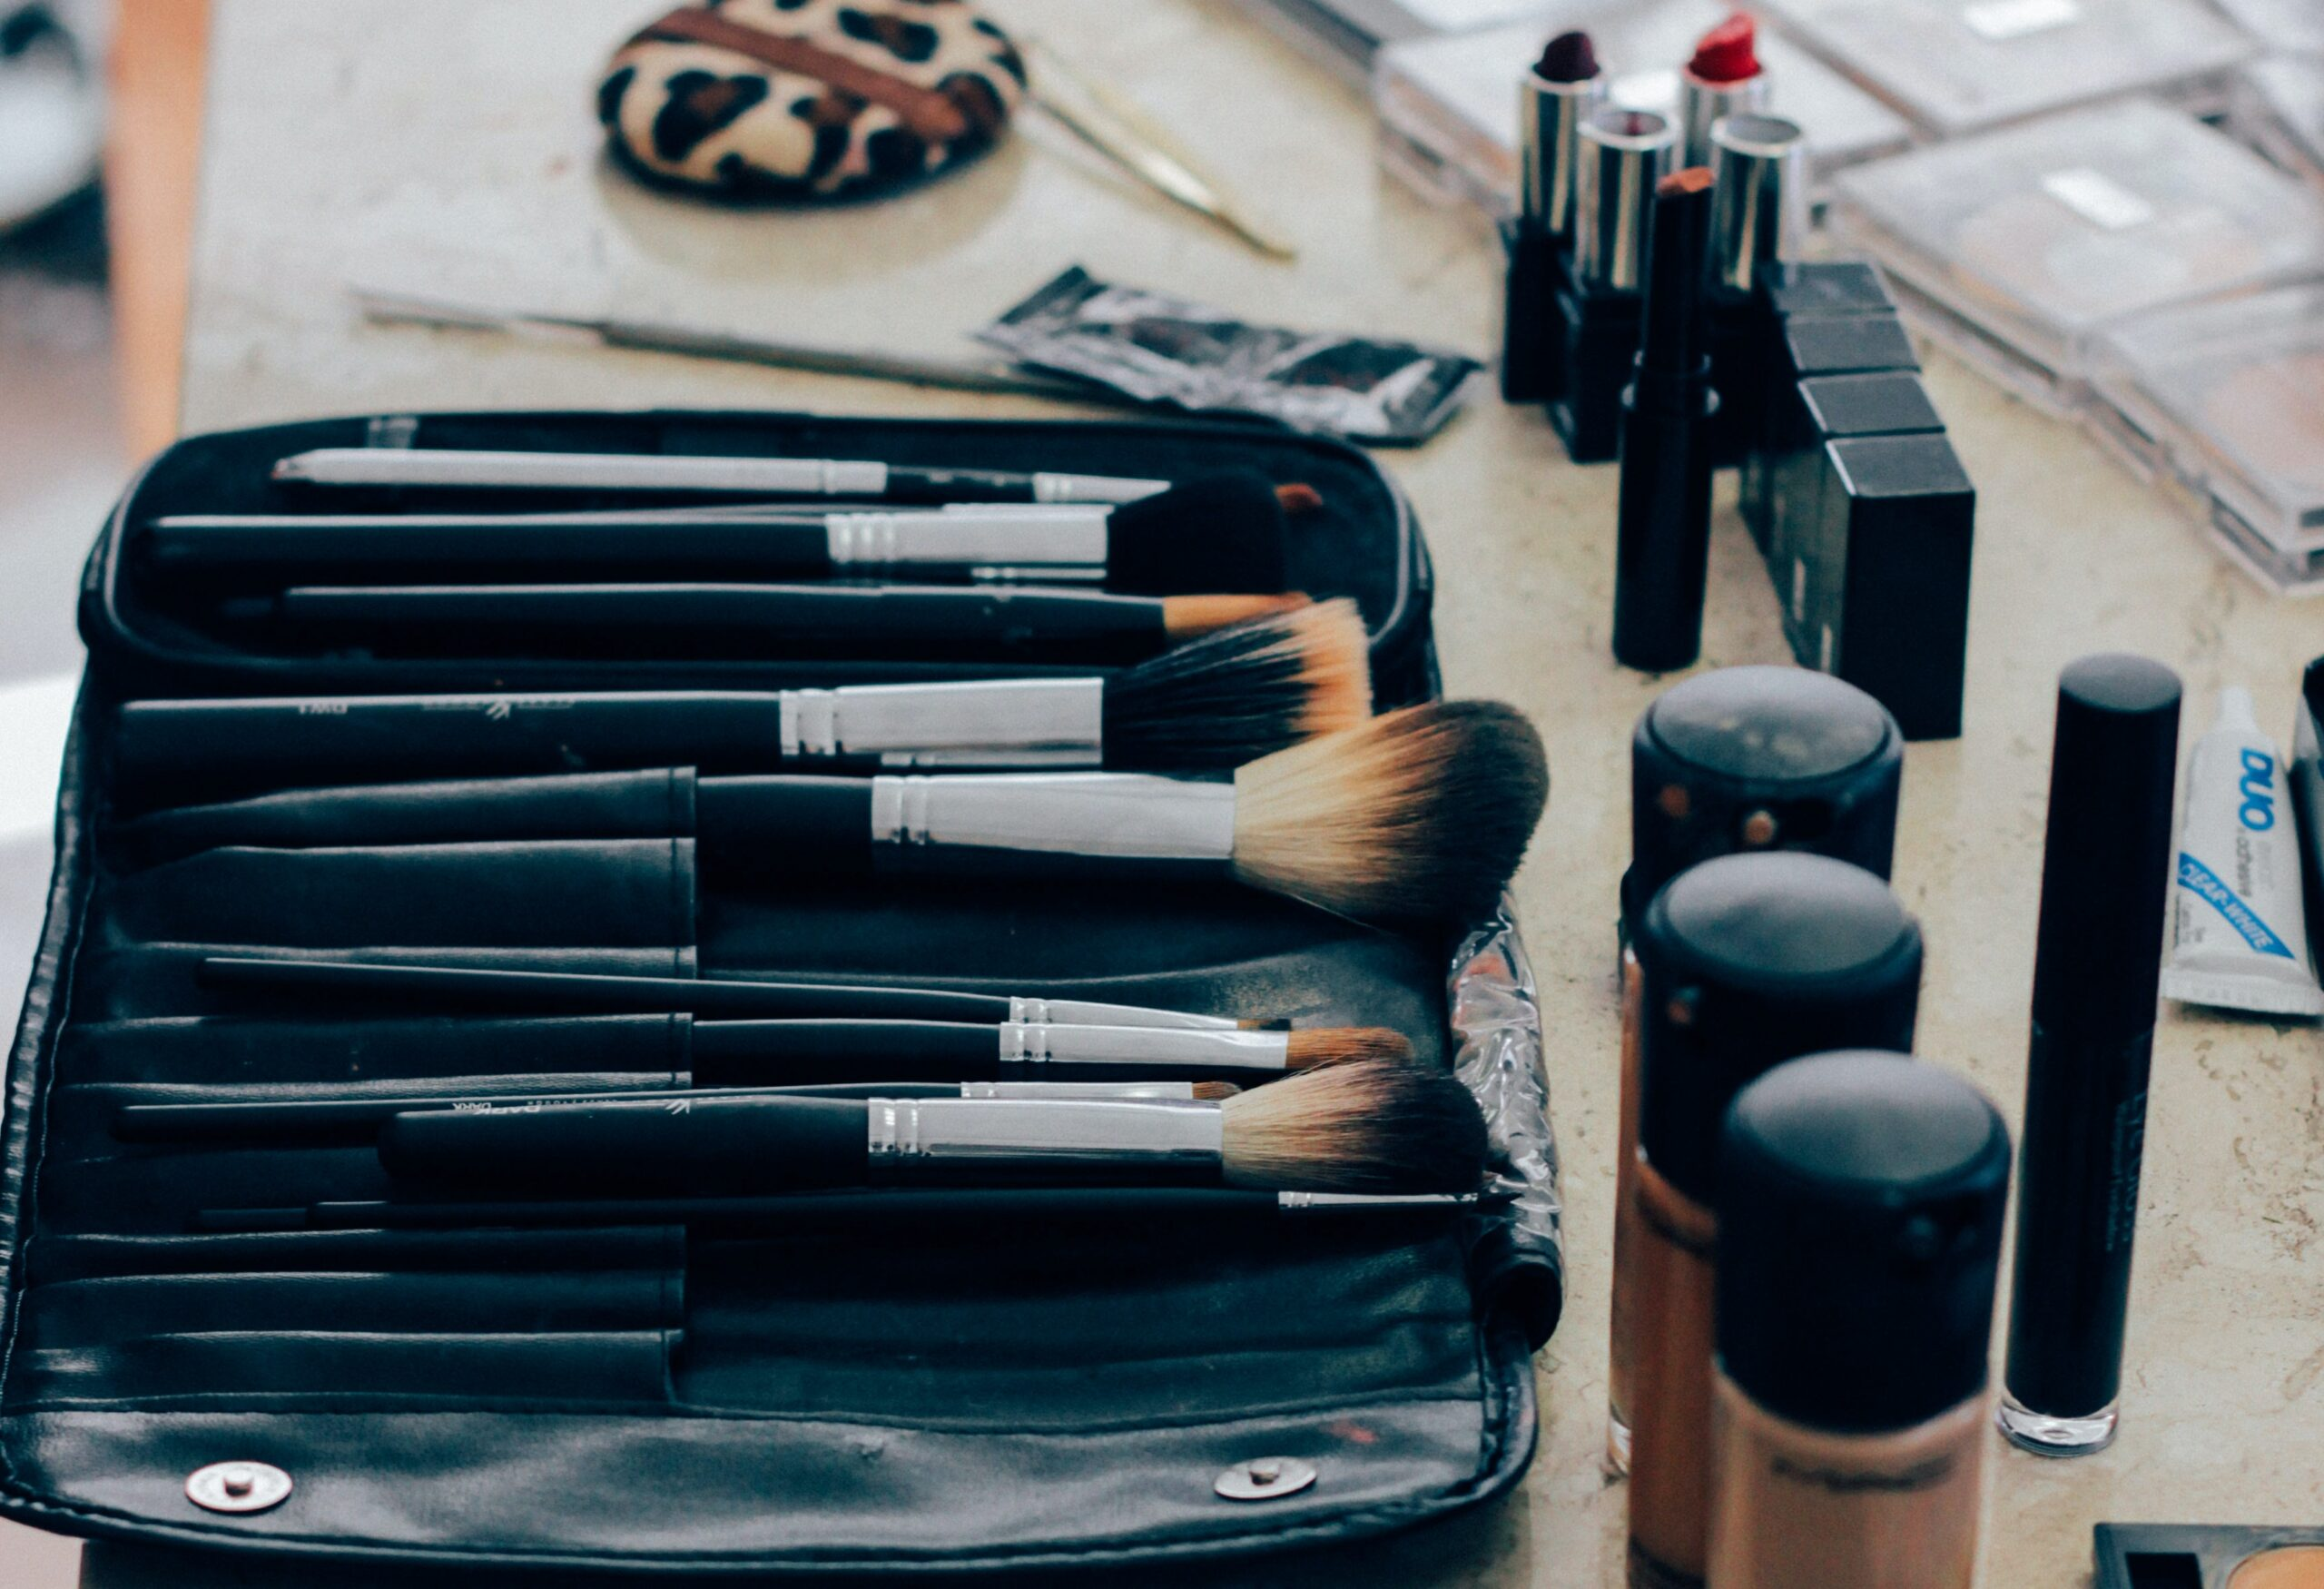 Nyx Total Control Drop Foundation, Nyx Lipstick